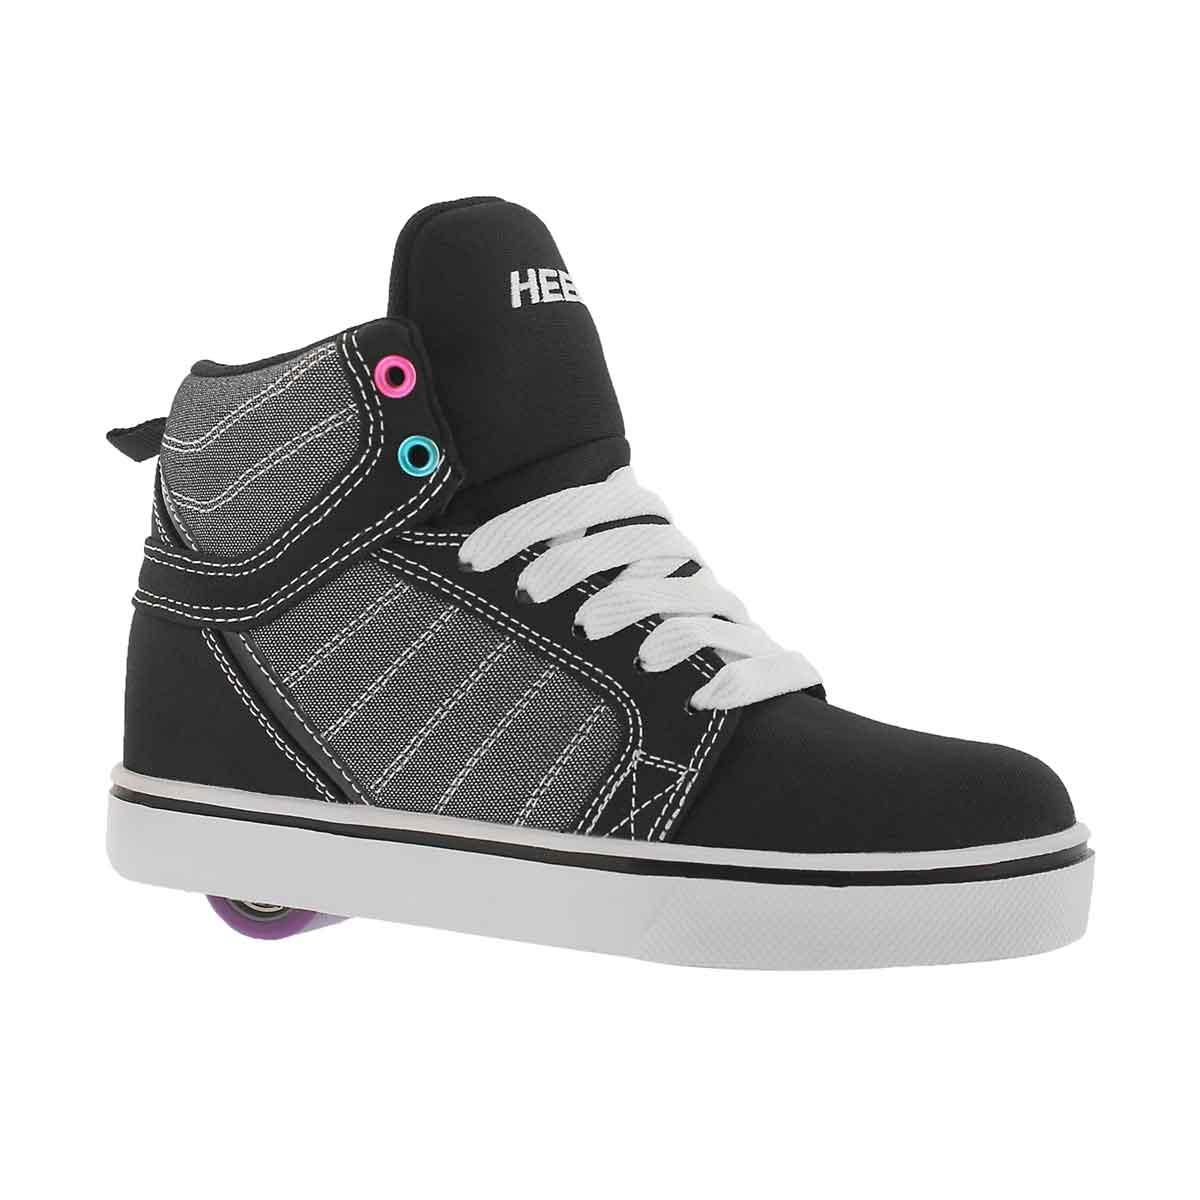 Girls' UPTOWN blk/sprkle/mlti hi skt sneakers